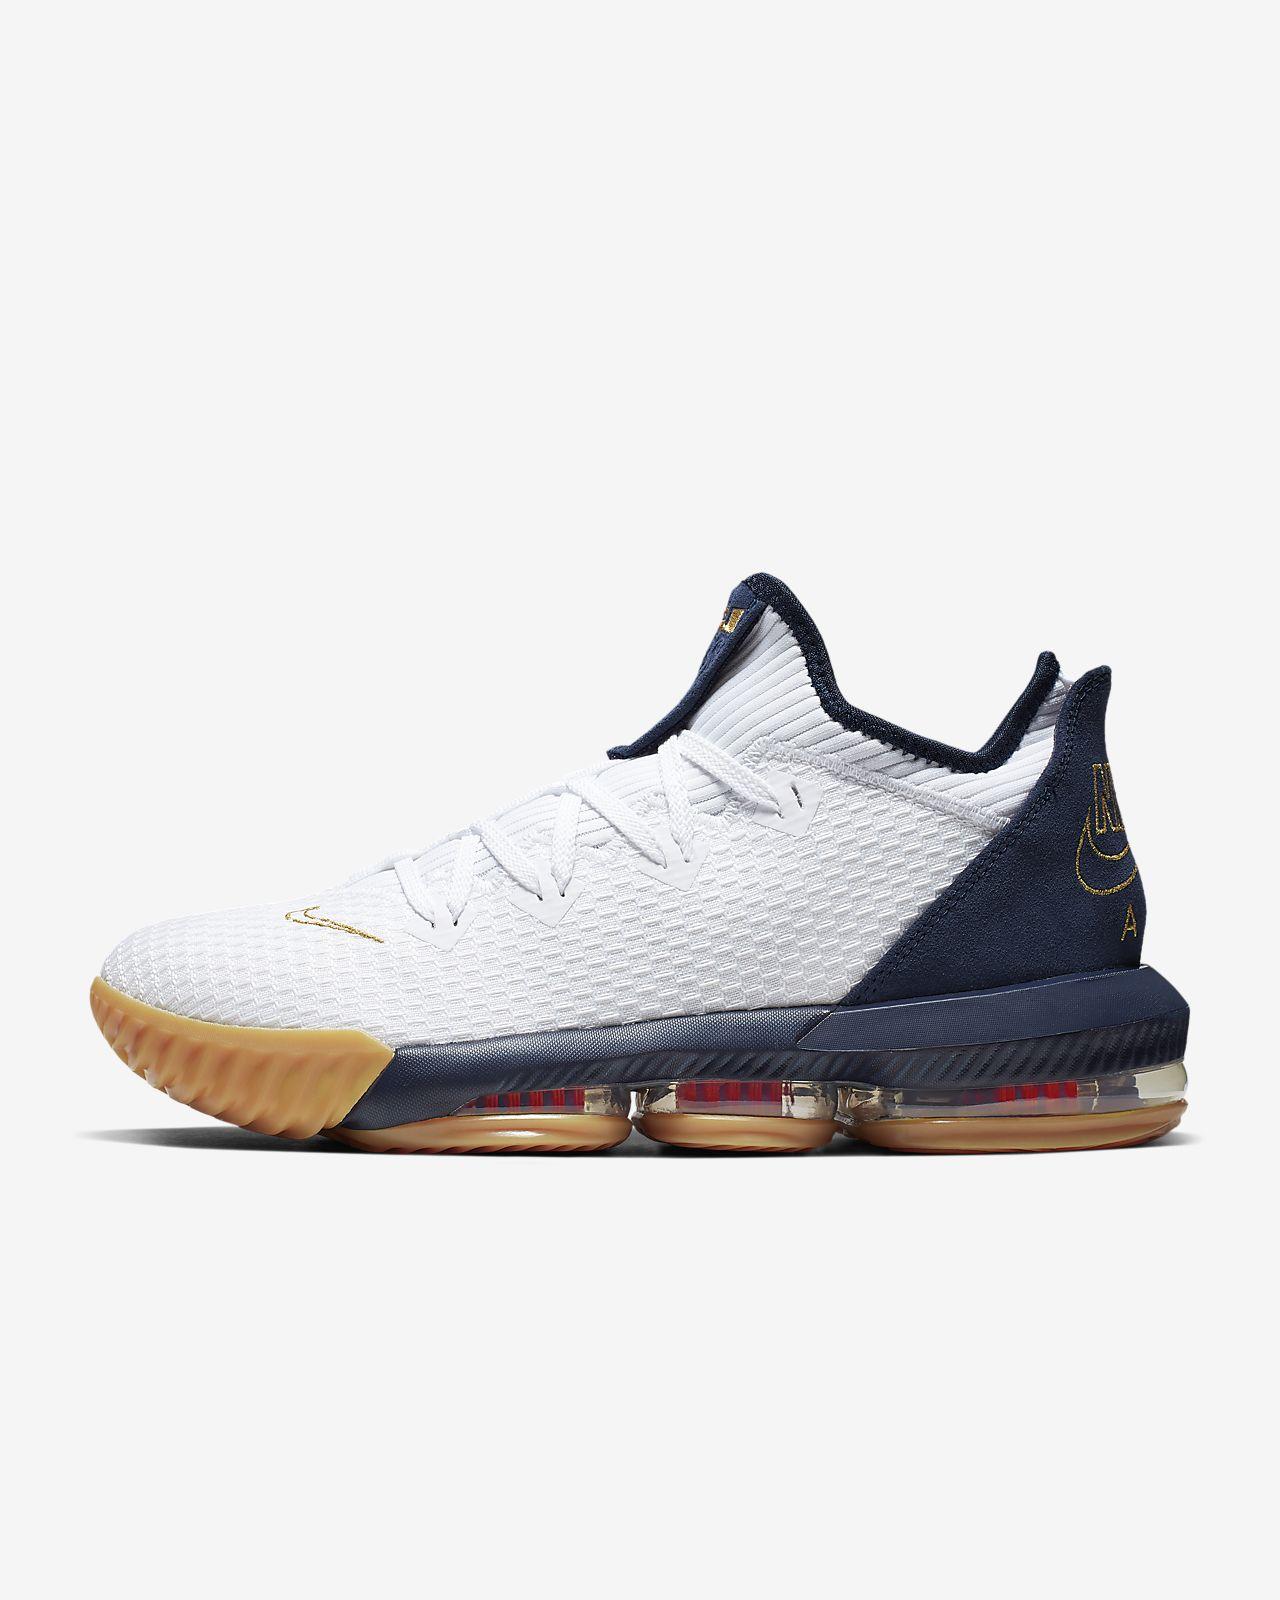 LeBron 16 Low Basketball Shoe